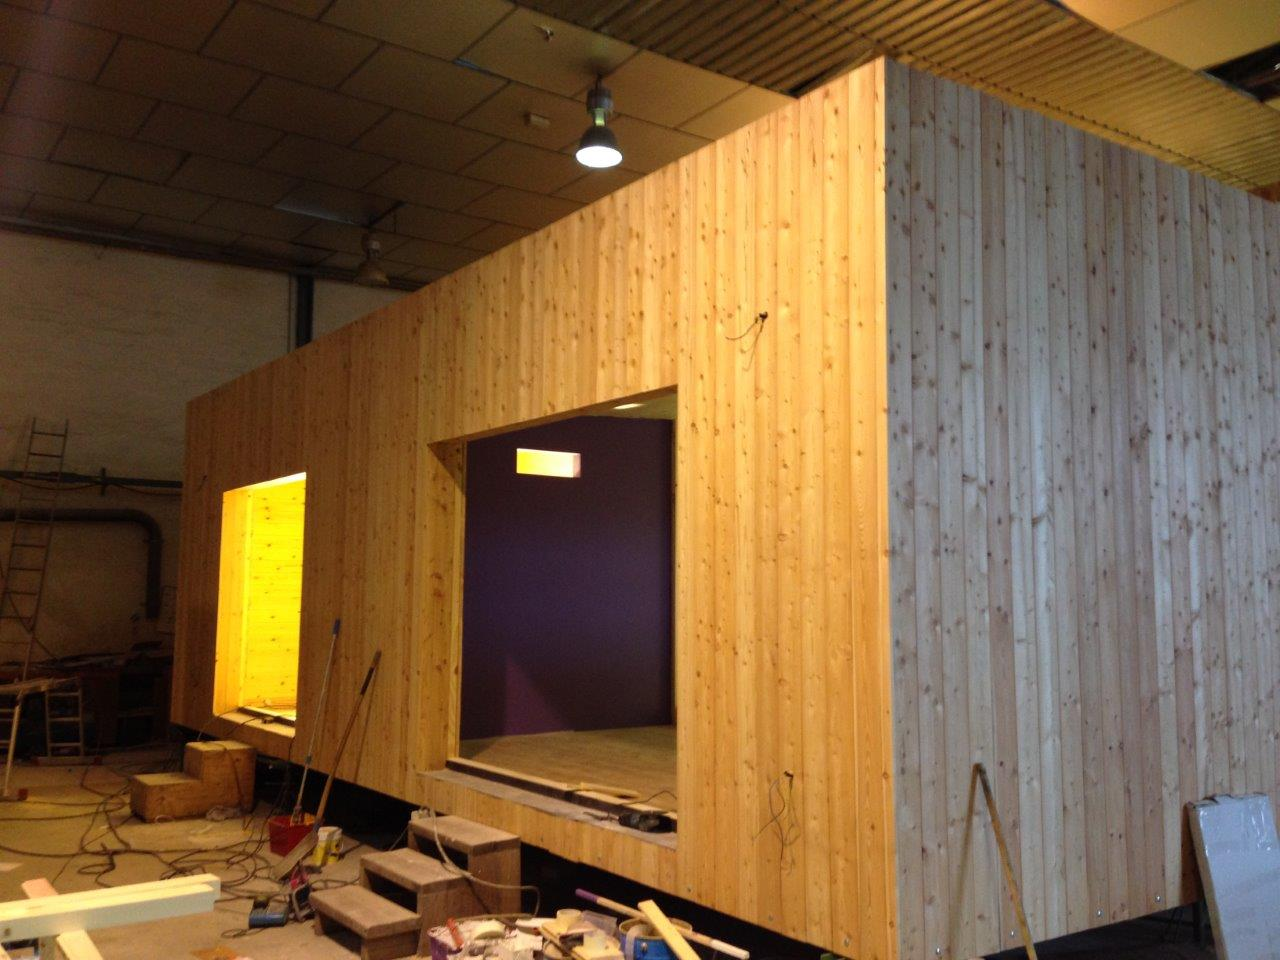 Casas de madera a medida f brica en valencia - Madera a medida ...